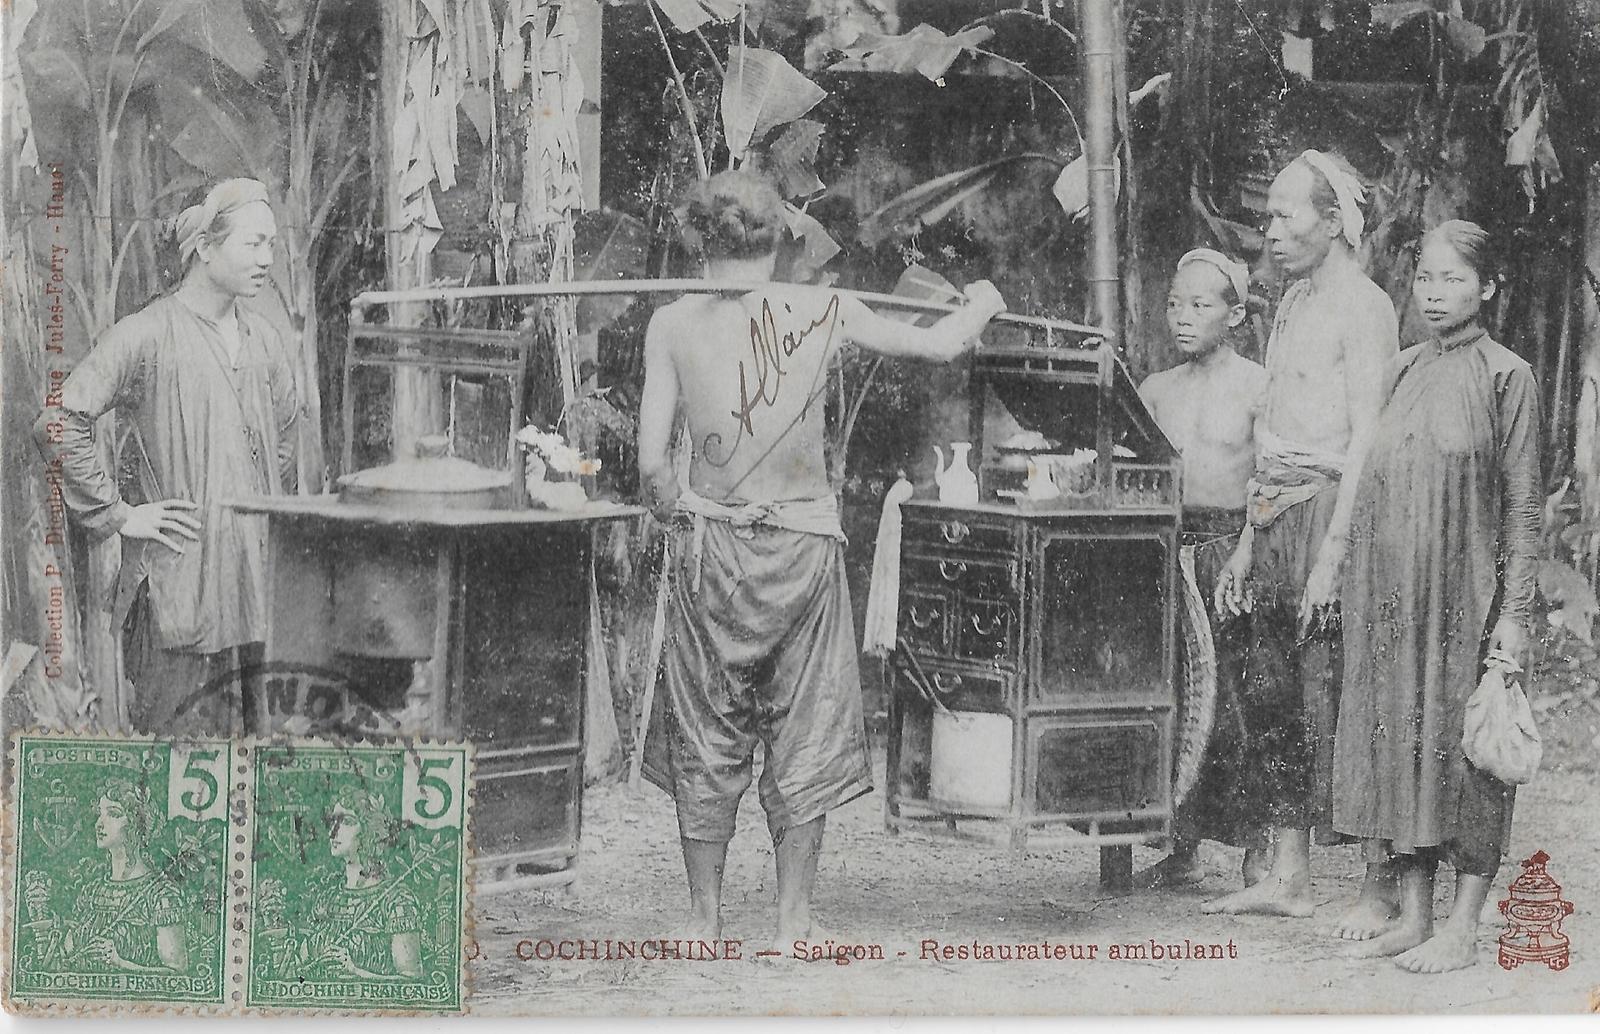 Saigon -  Restaurateur ambulant